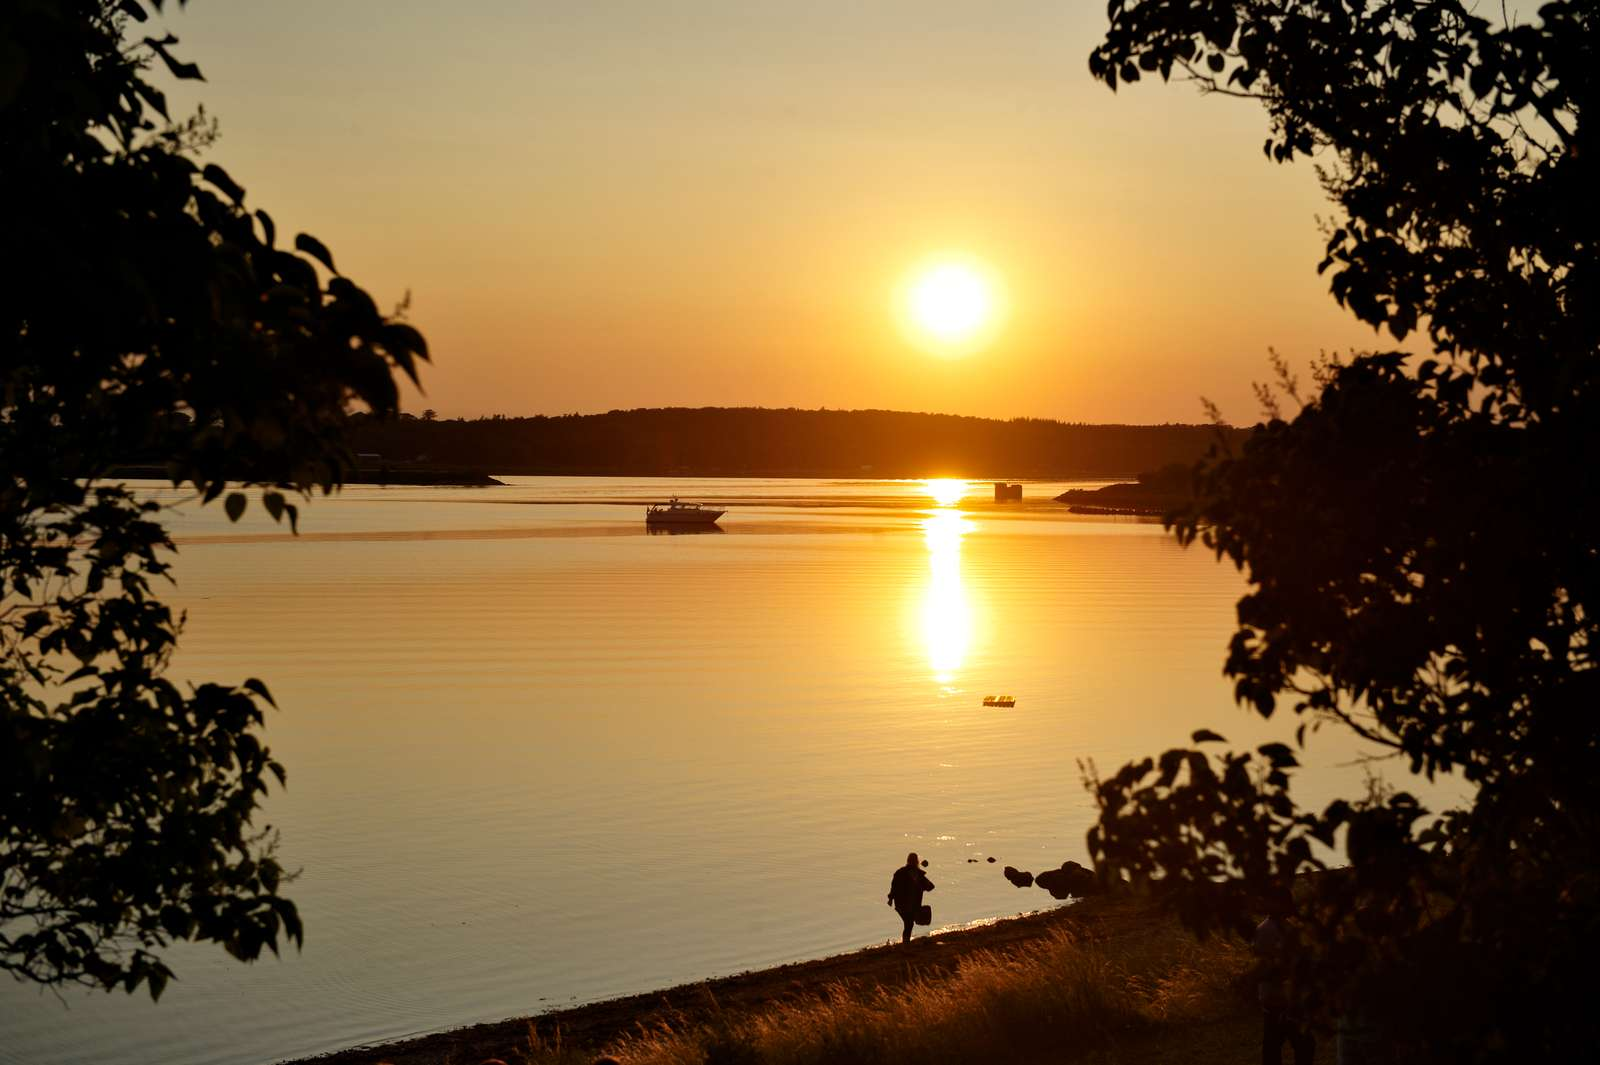 Sonnenuntergang im Roskilde Fjord in Dänemark